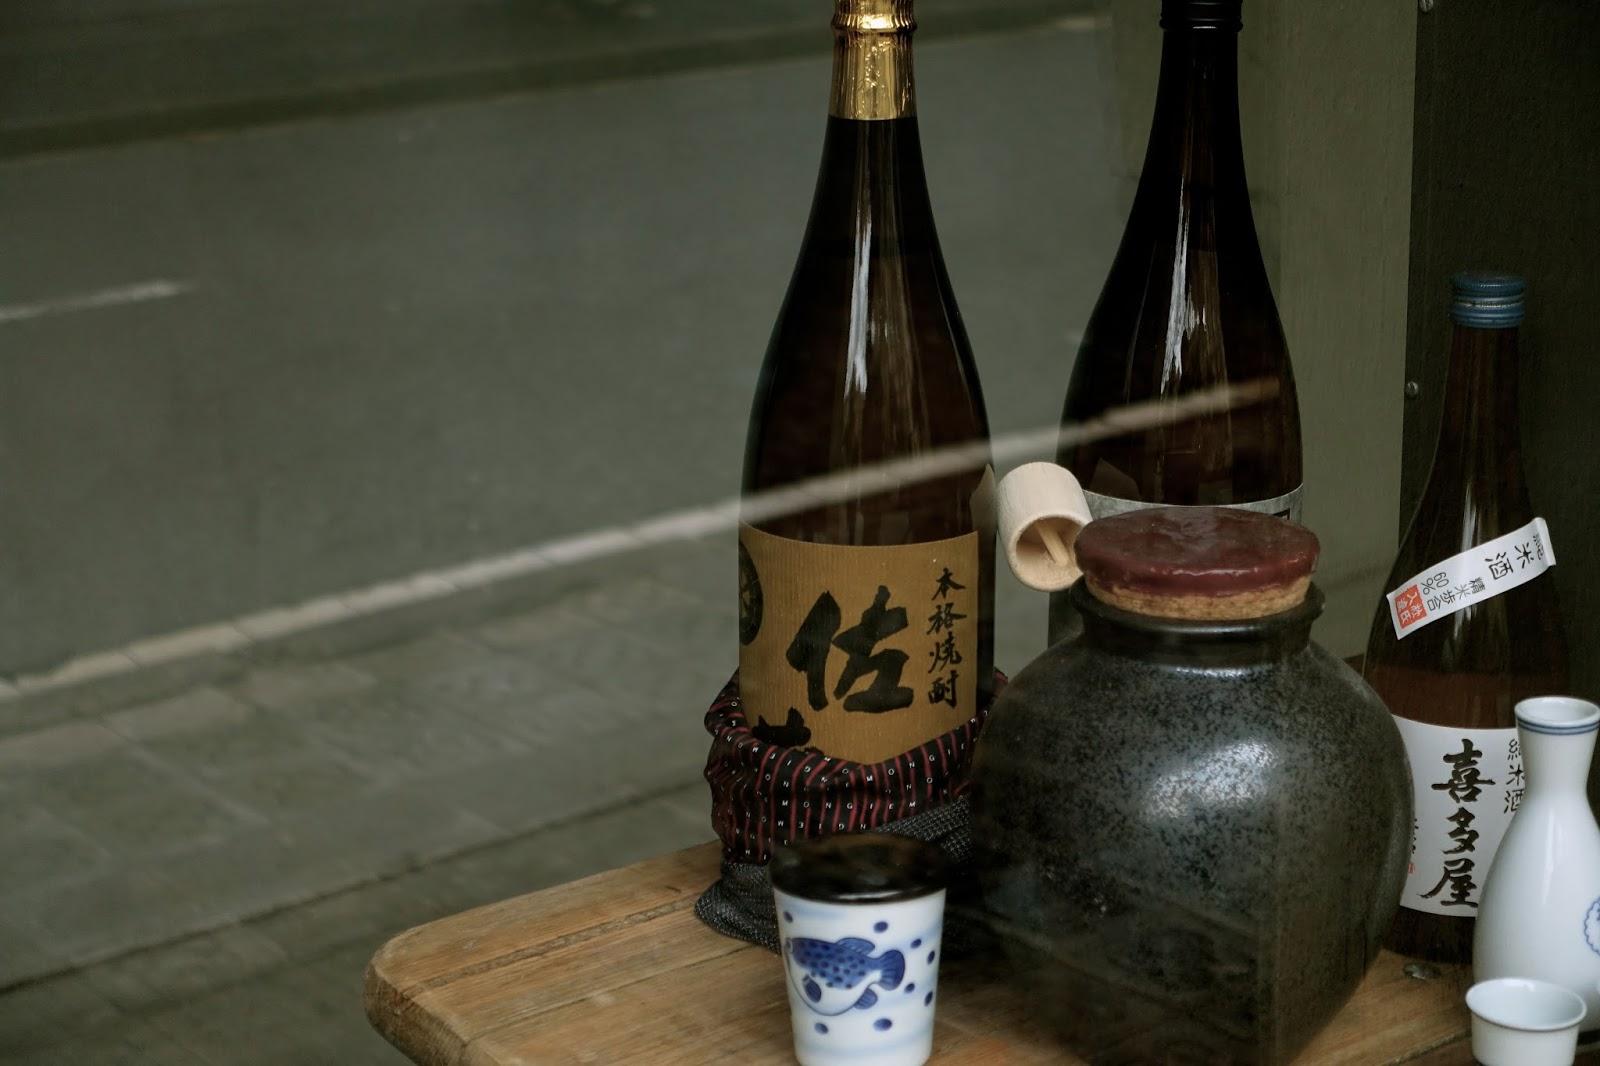 宵宵祇園(YoI Yoi Gion)